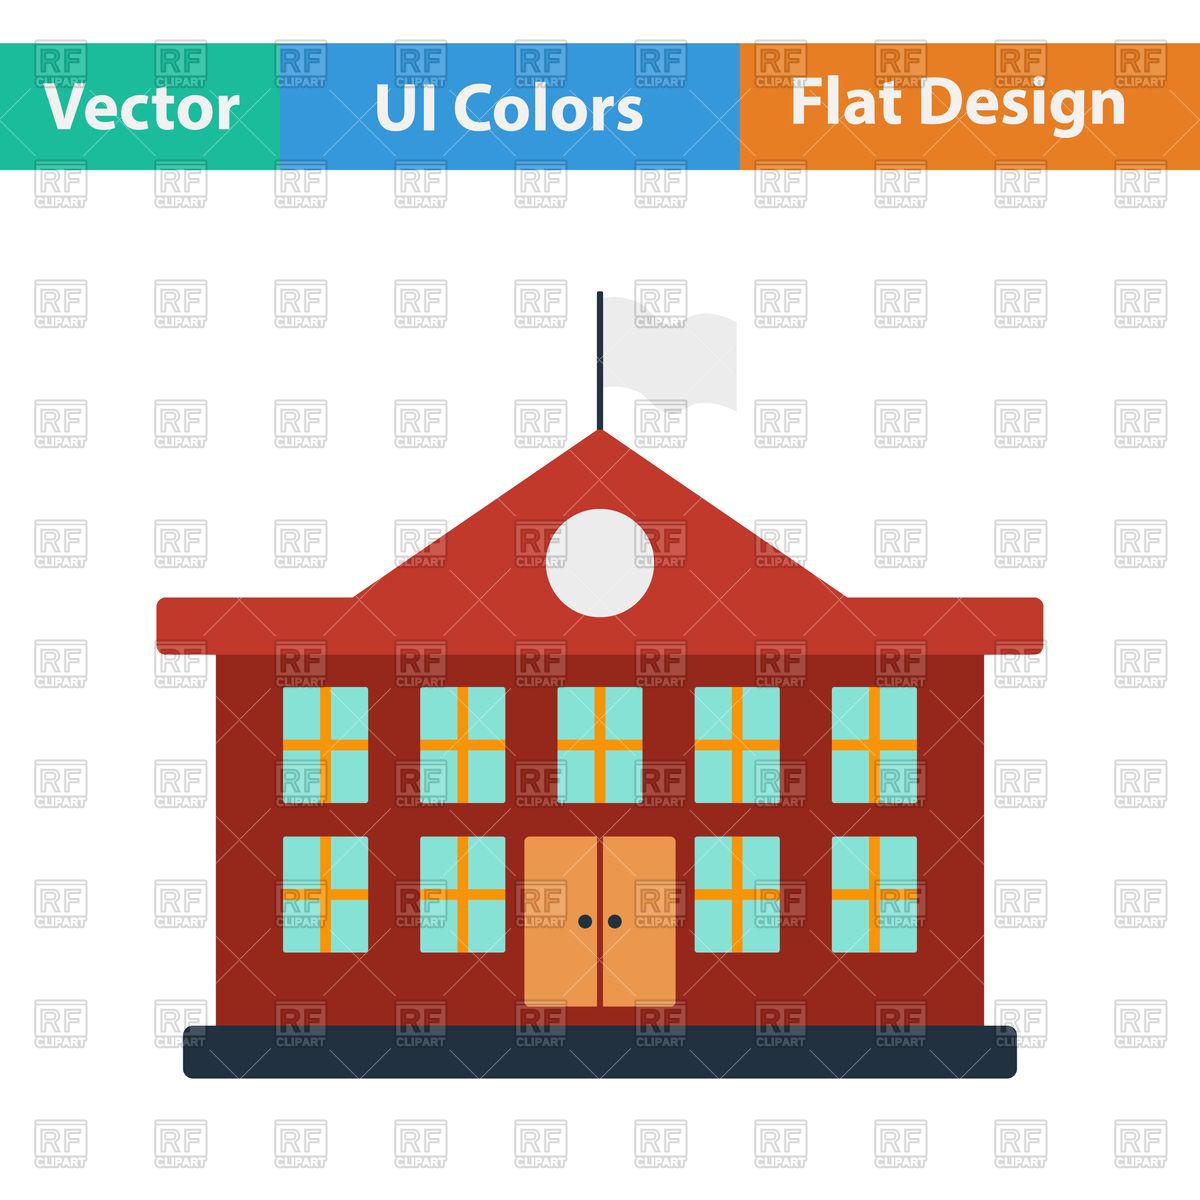 1200x1200 Flat Design Icon Of School Building In Ui Colors Vector Image